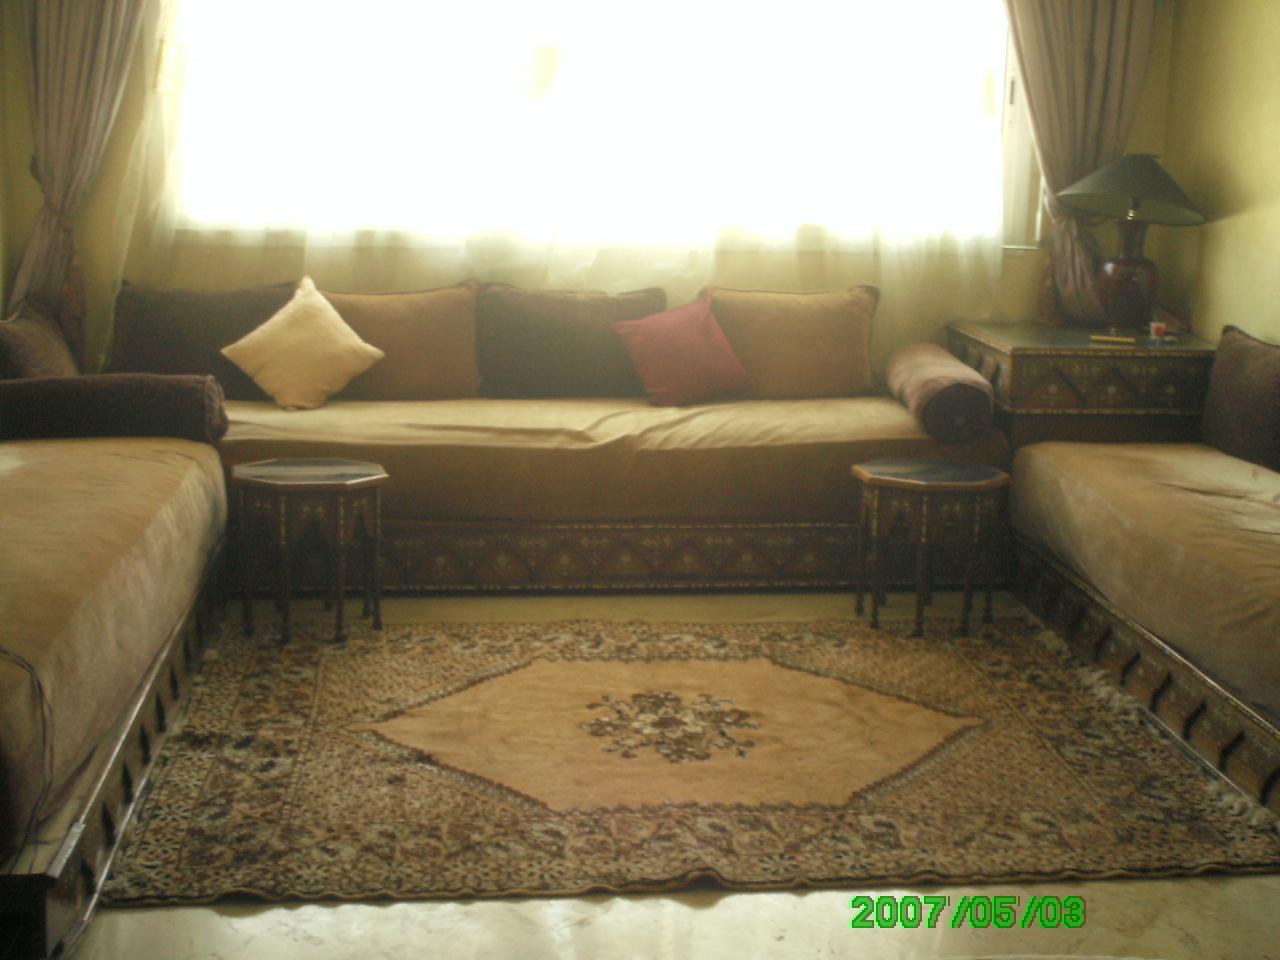 Appartement A Louer Casablanca Particulier